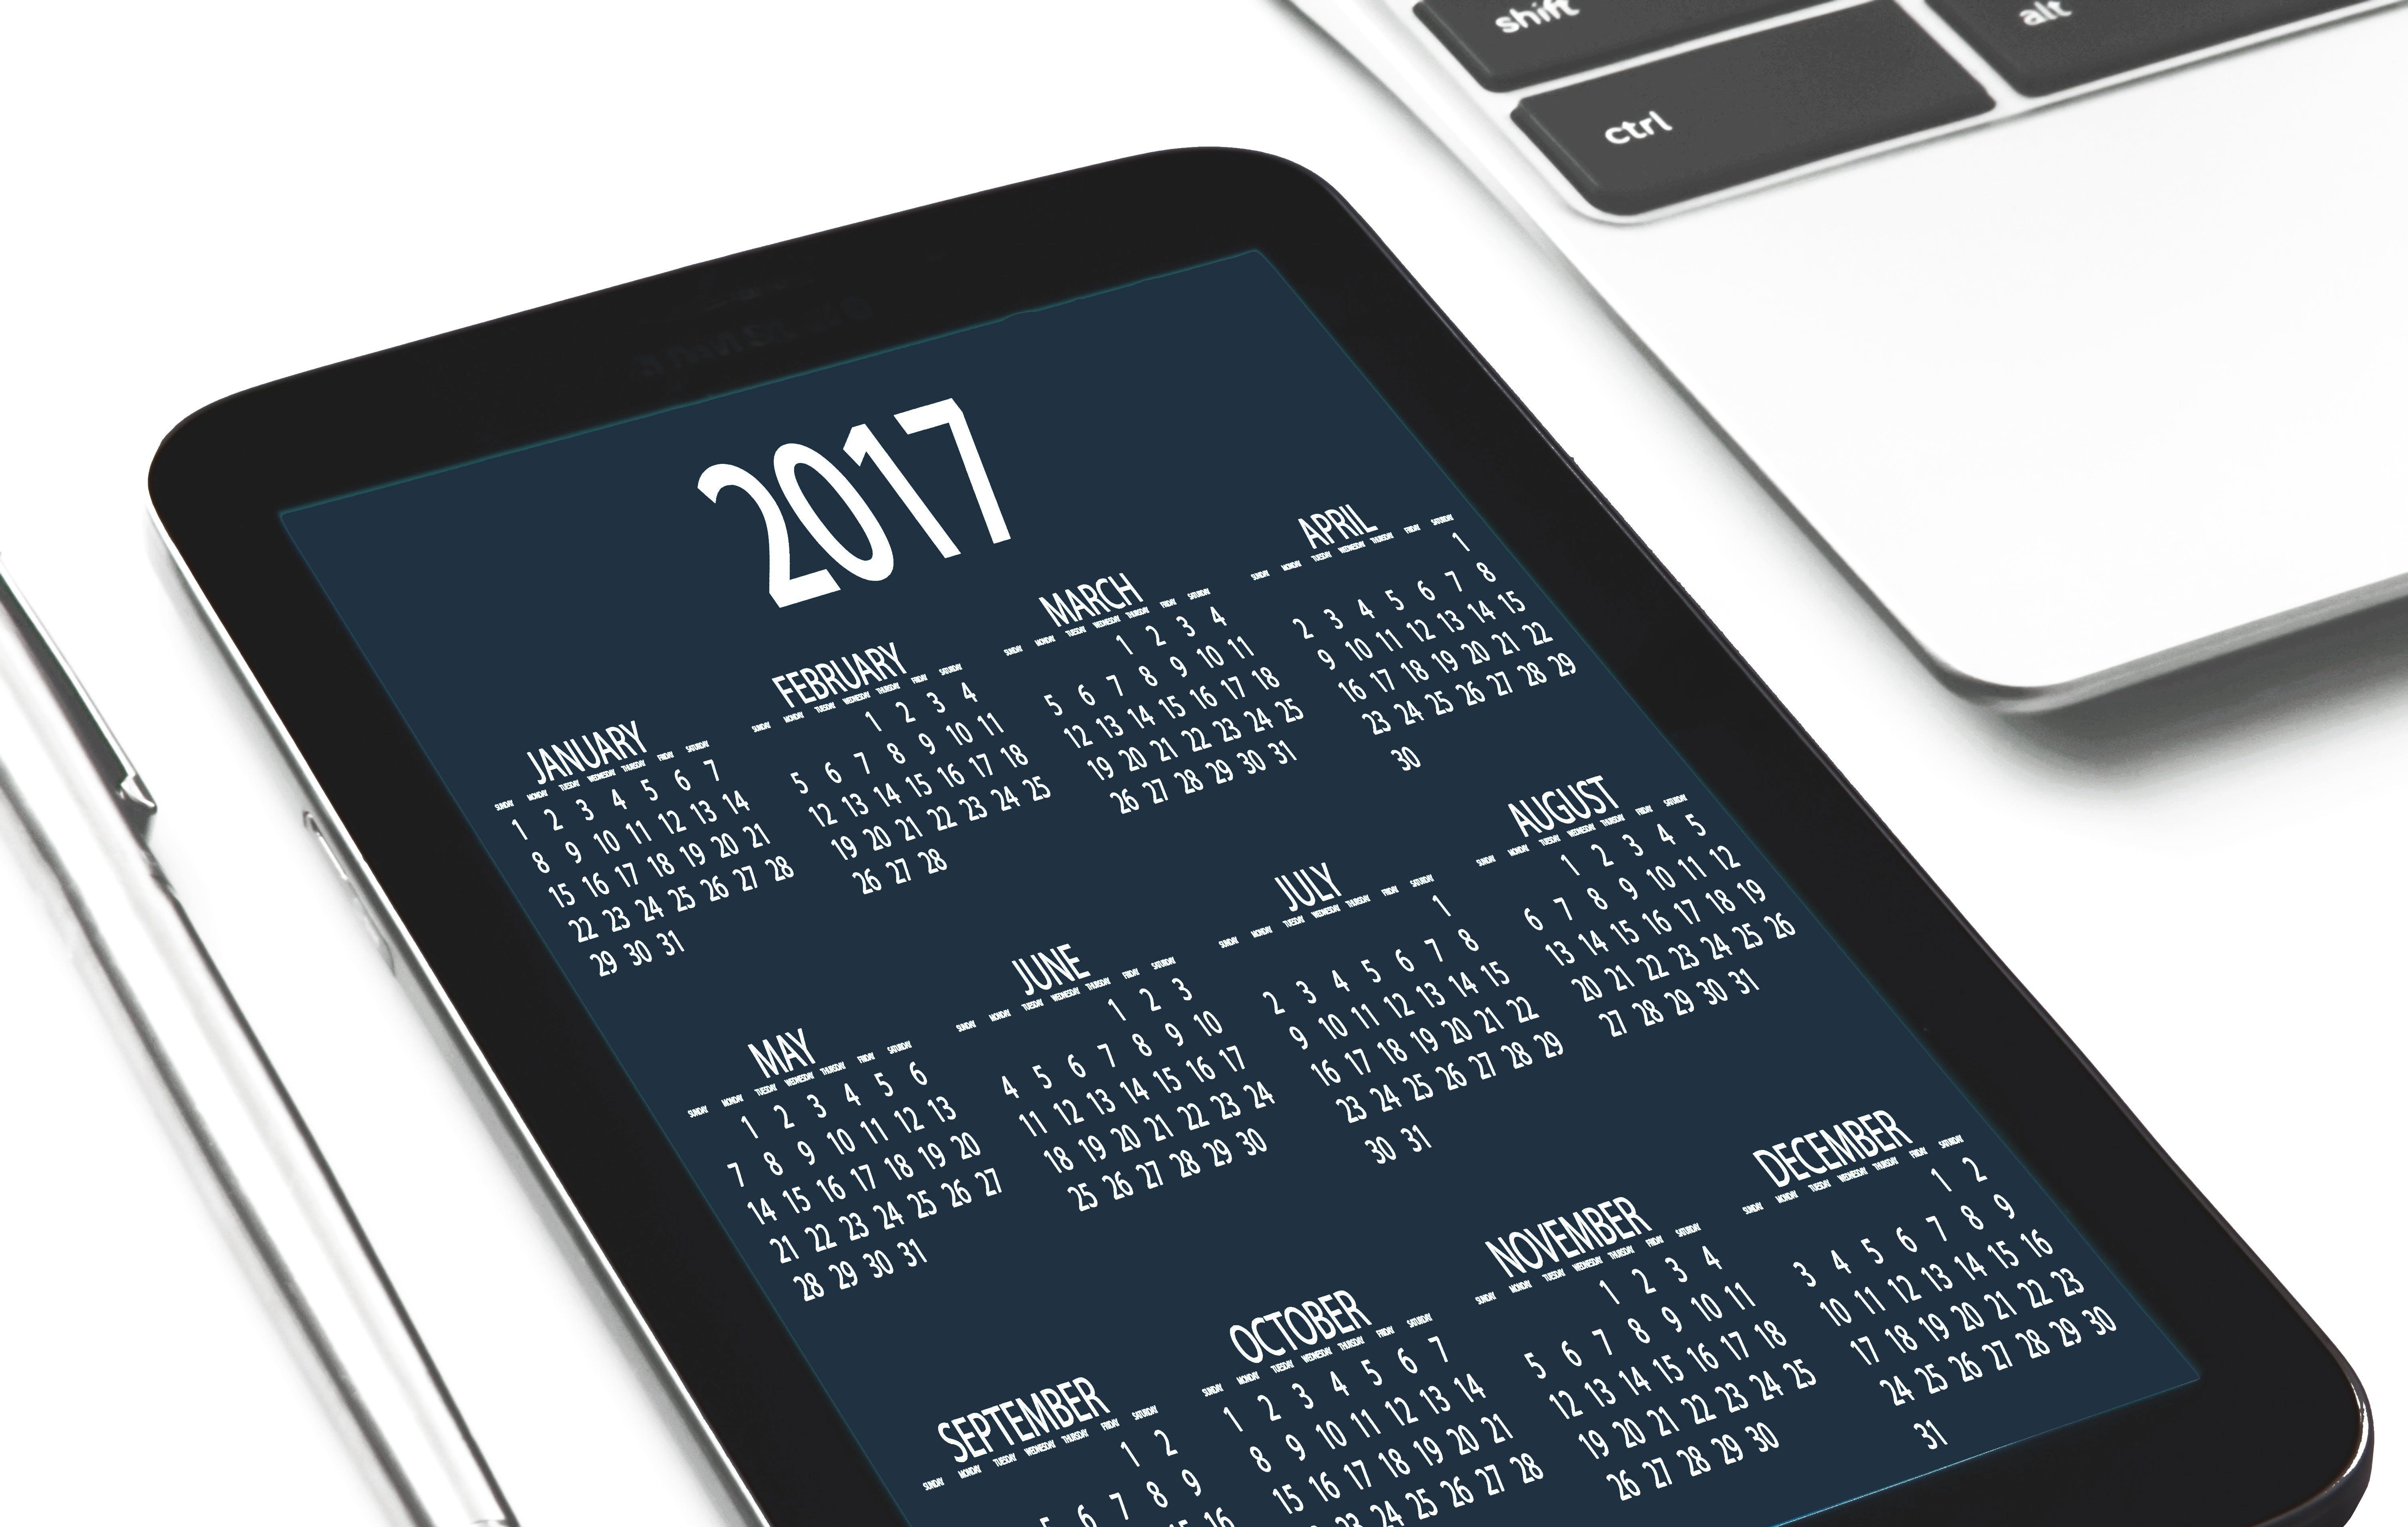 Black Tablet Computer Displaying 2017 Calendar